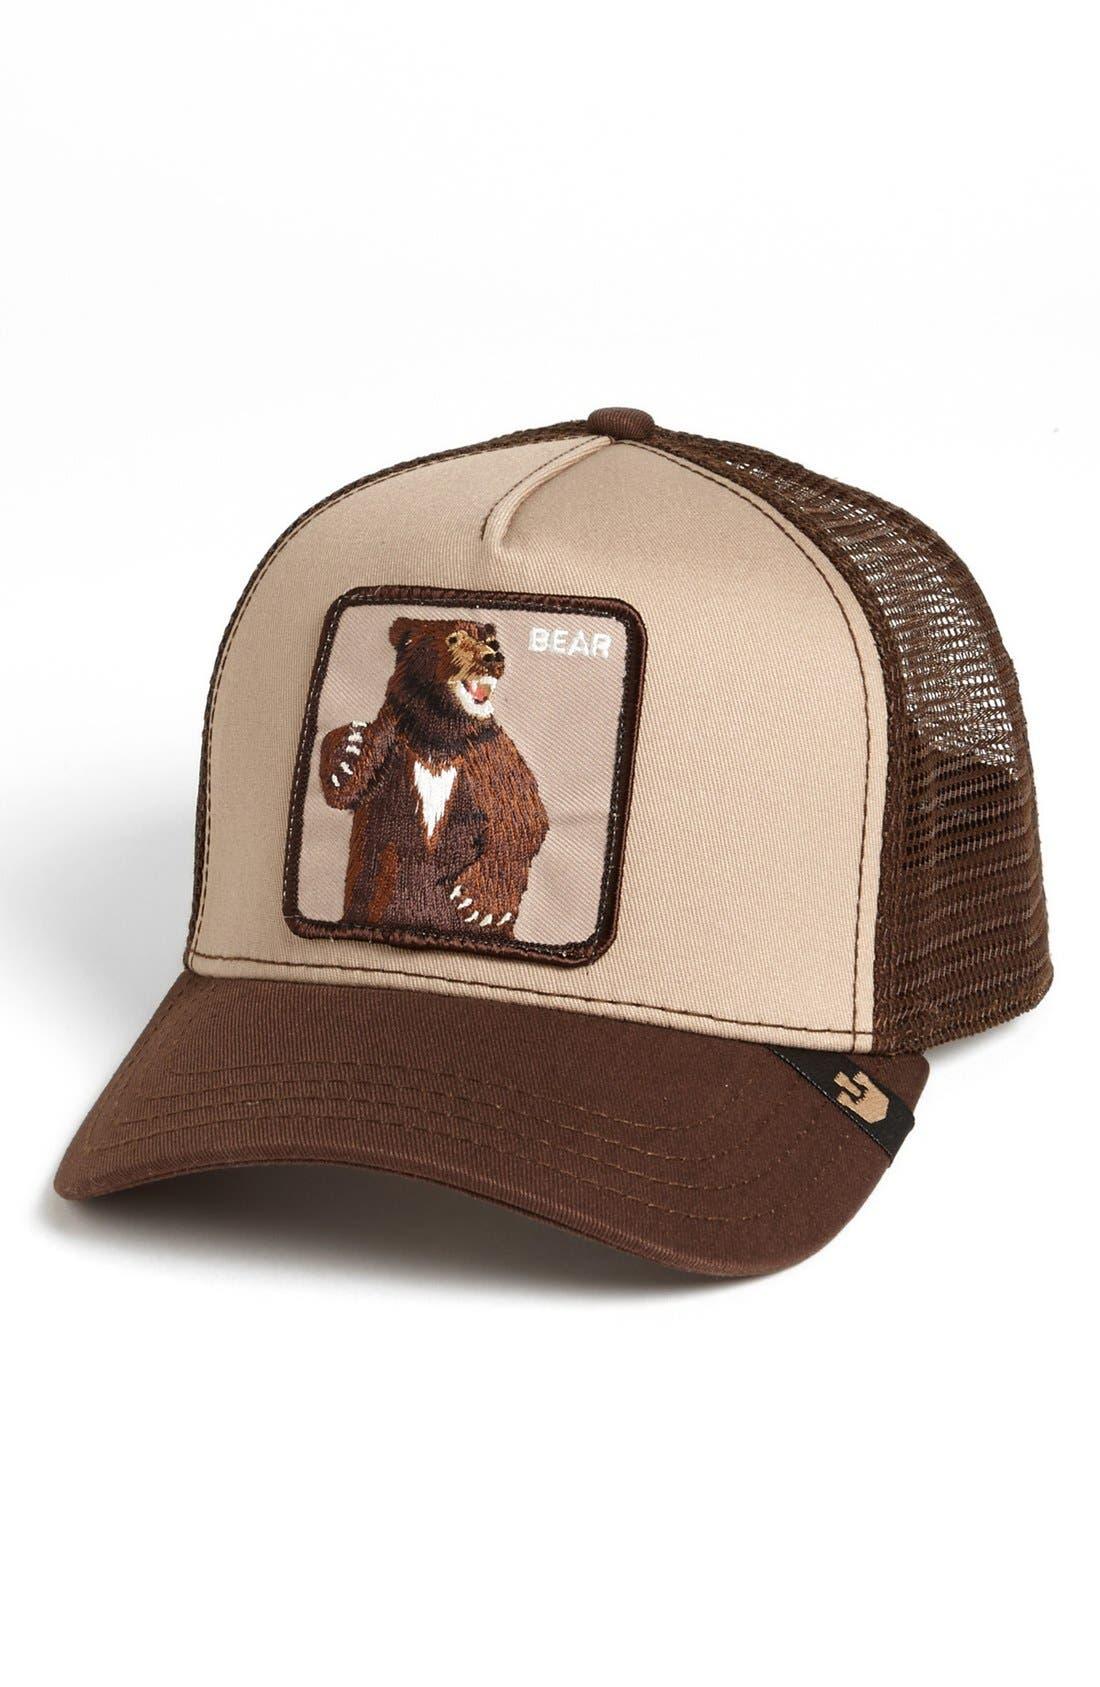 GOORIN BROTHERS 'Animal Farm - Lone Star Bear' Trucker Hat, Main, color, 201